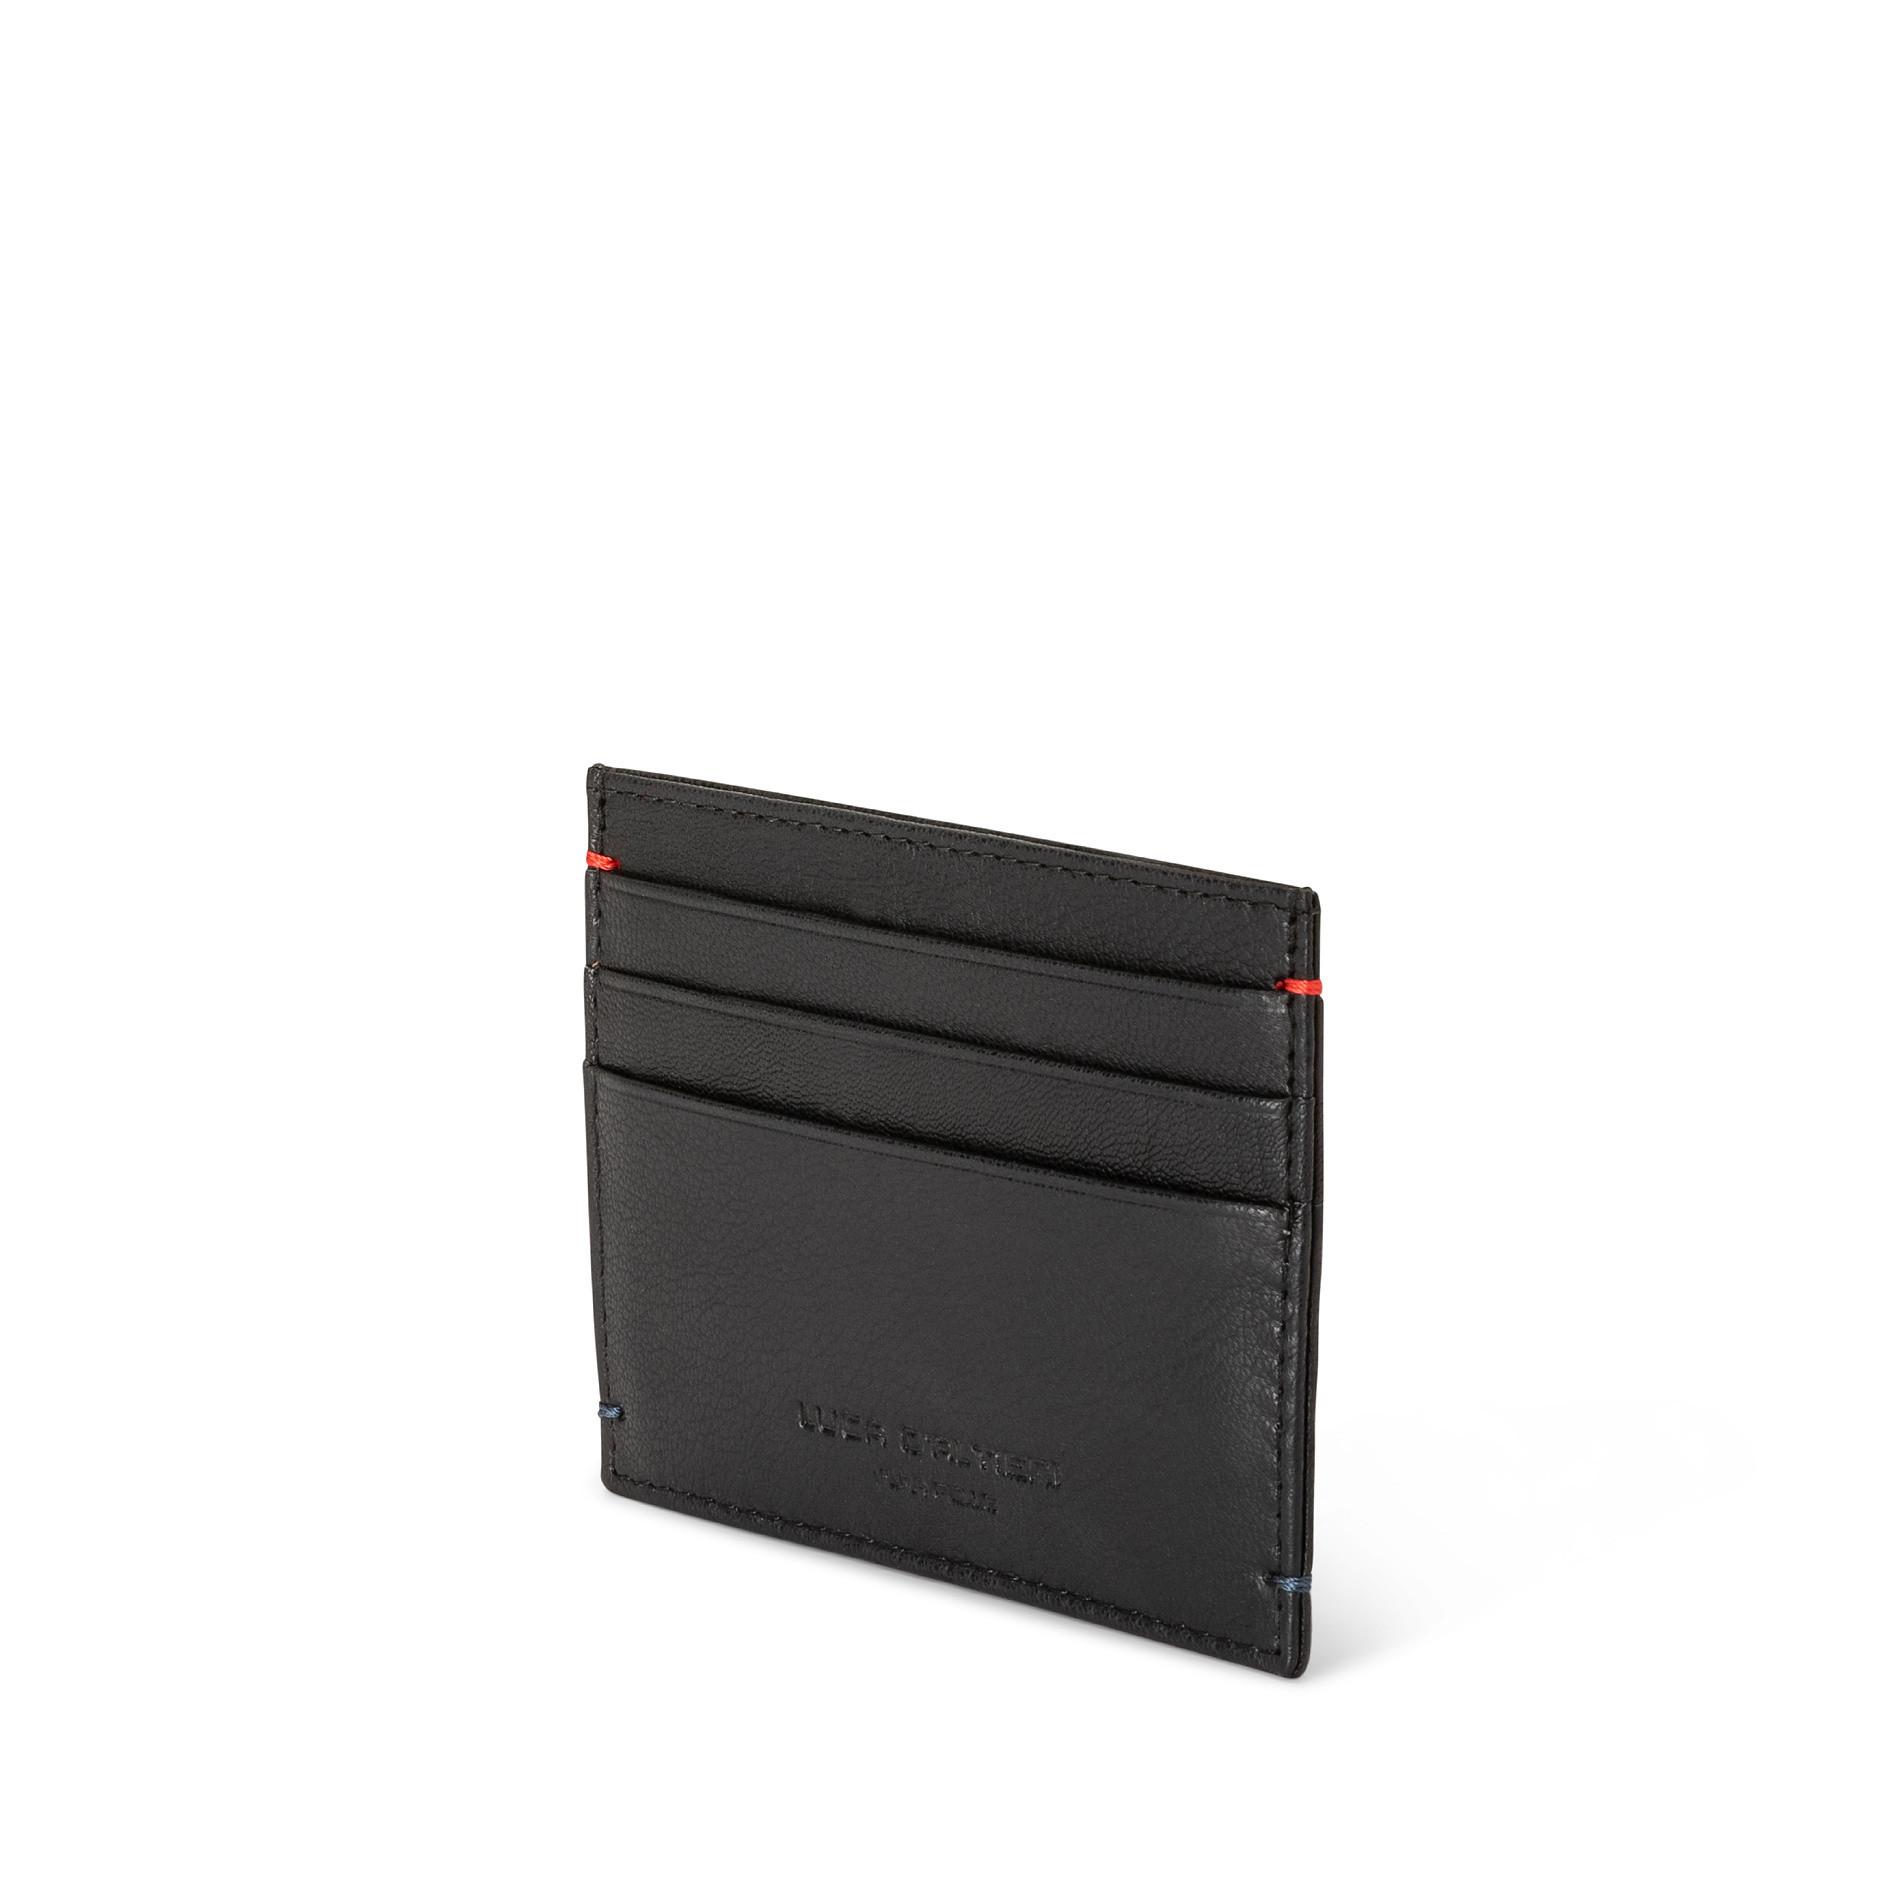 Porta carte in pelle, Nero, large image number 1